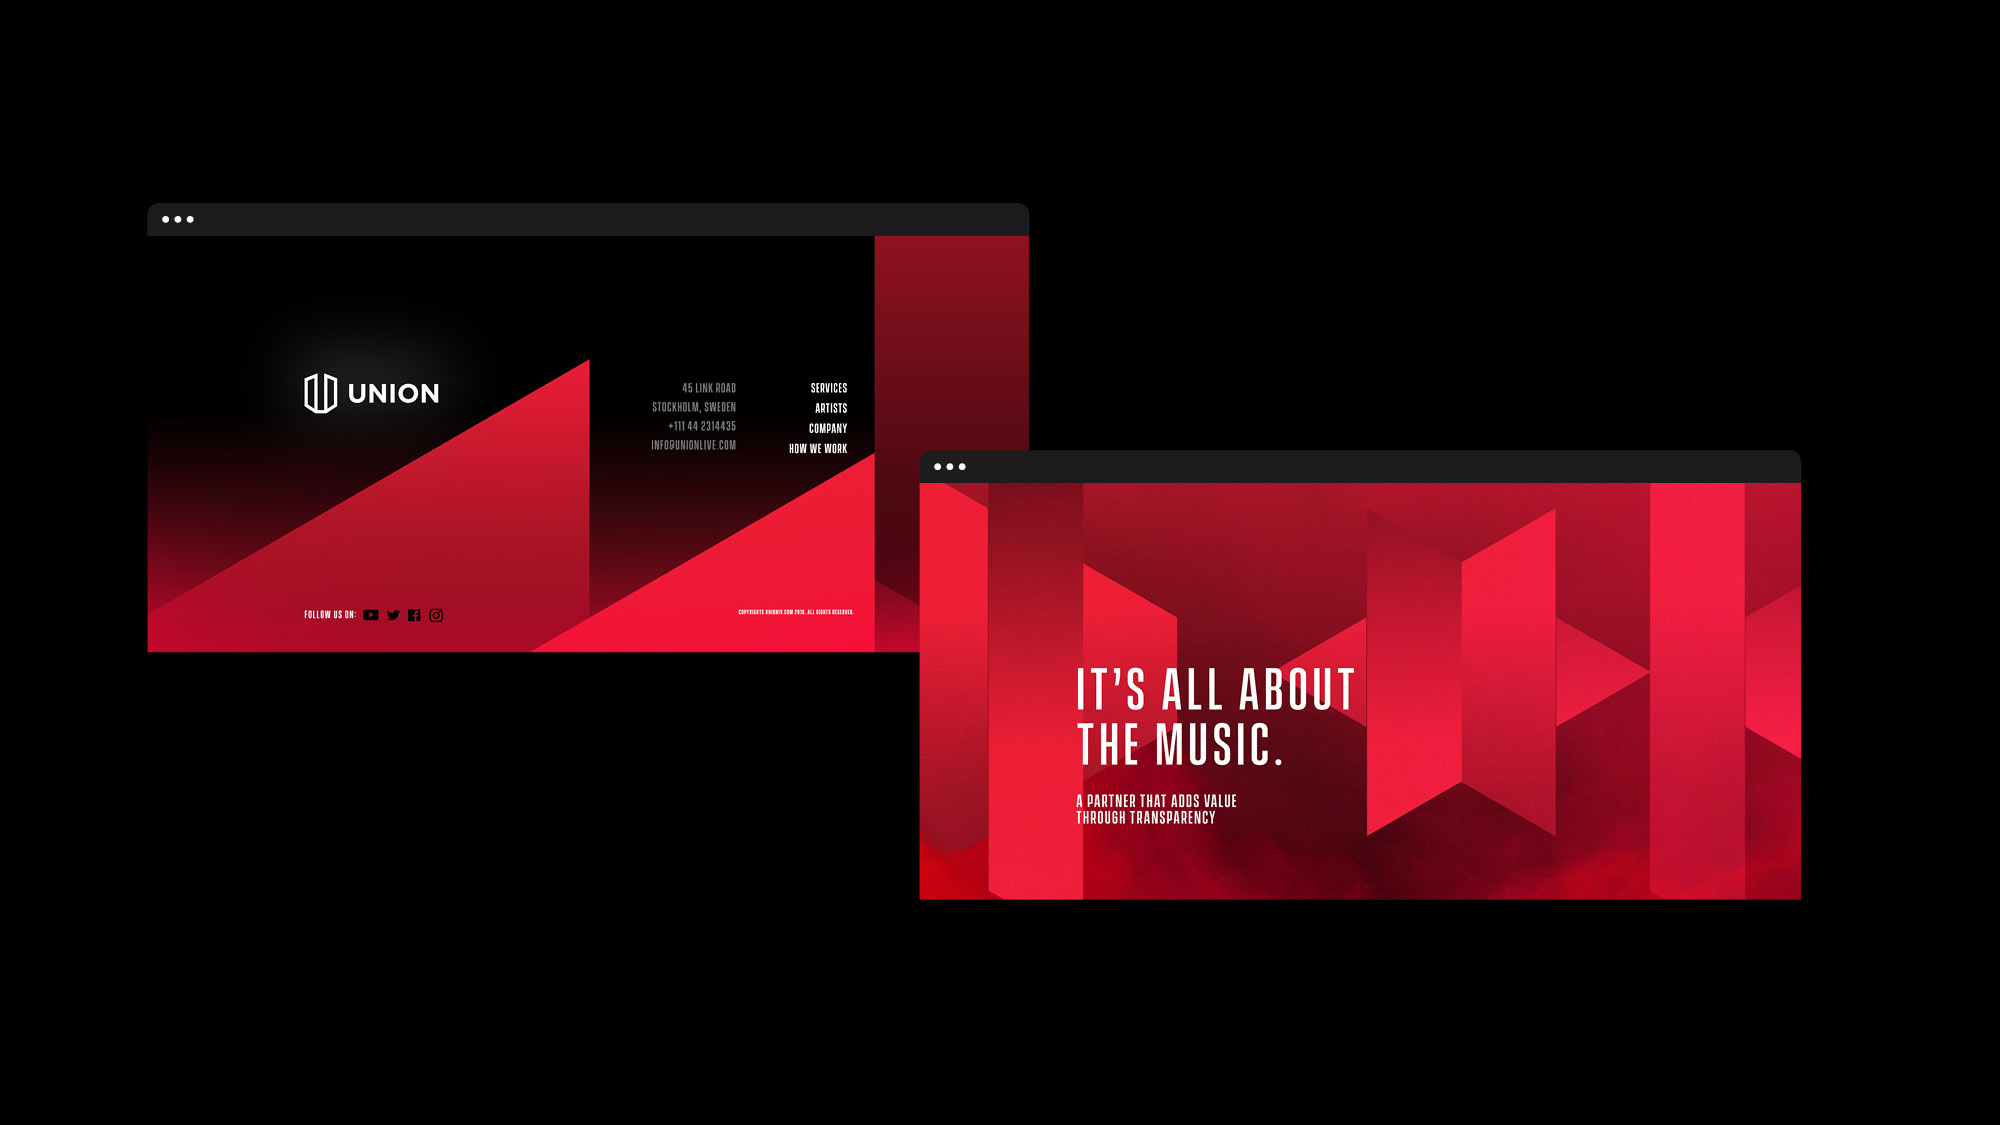 Nacione-Branding-Union-IV-Music7